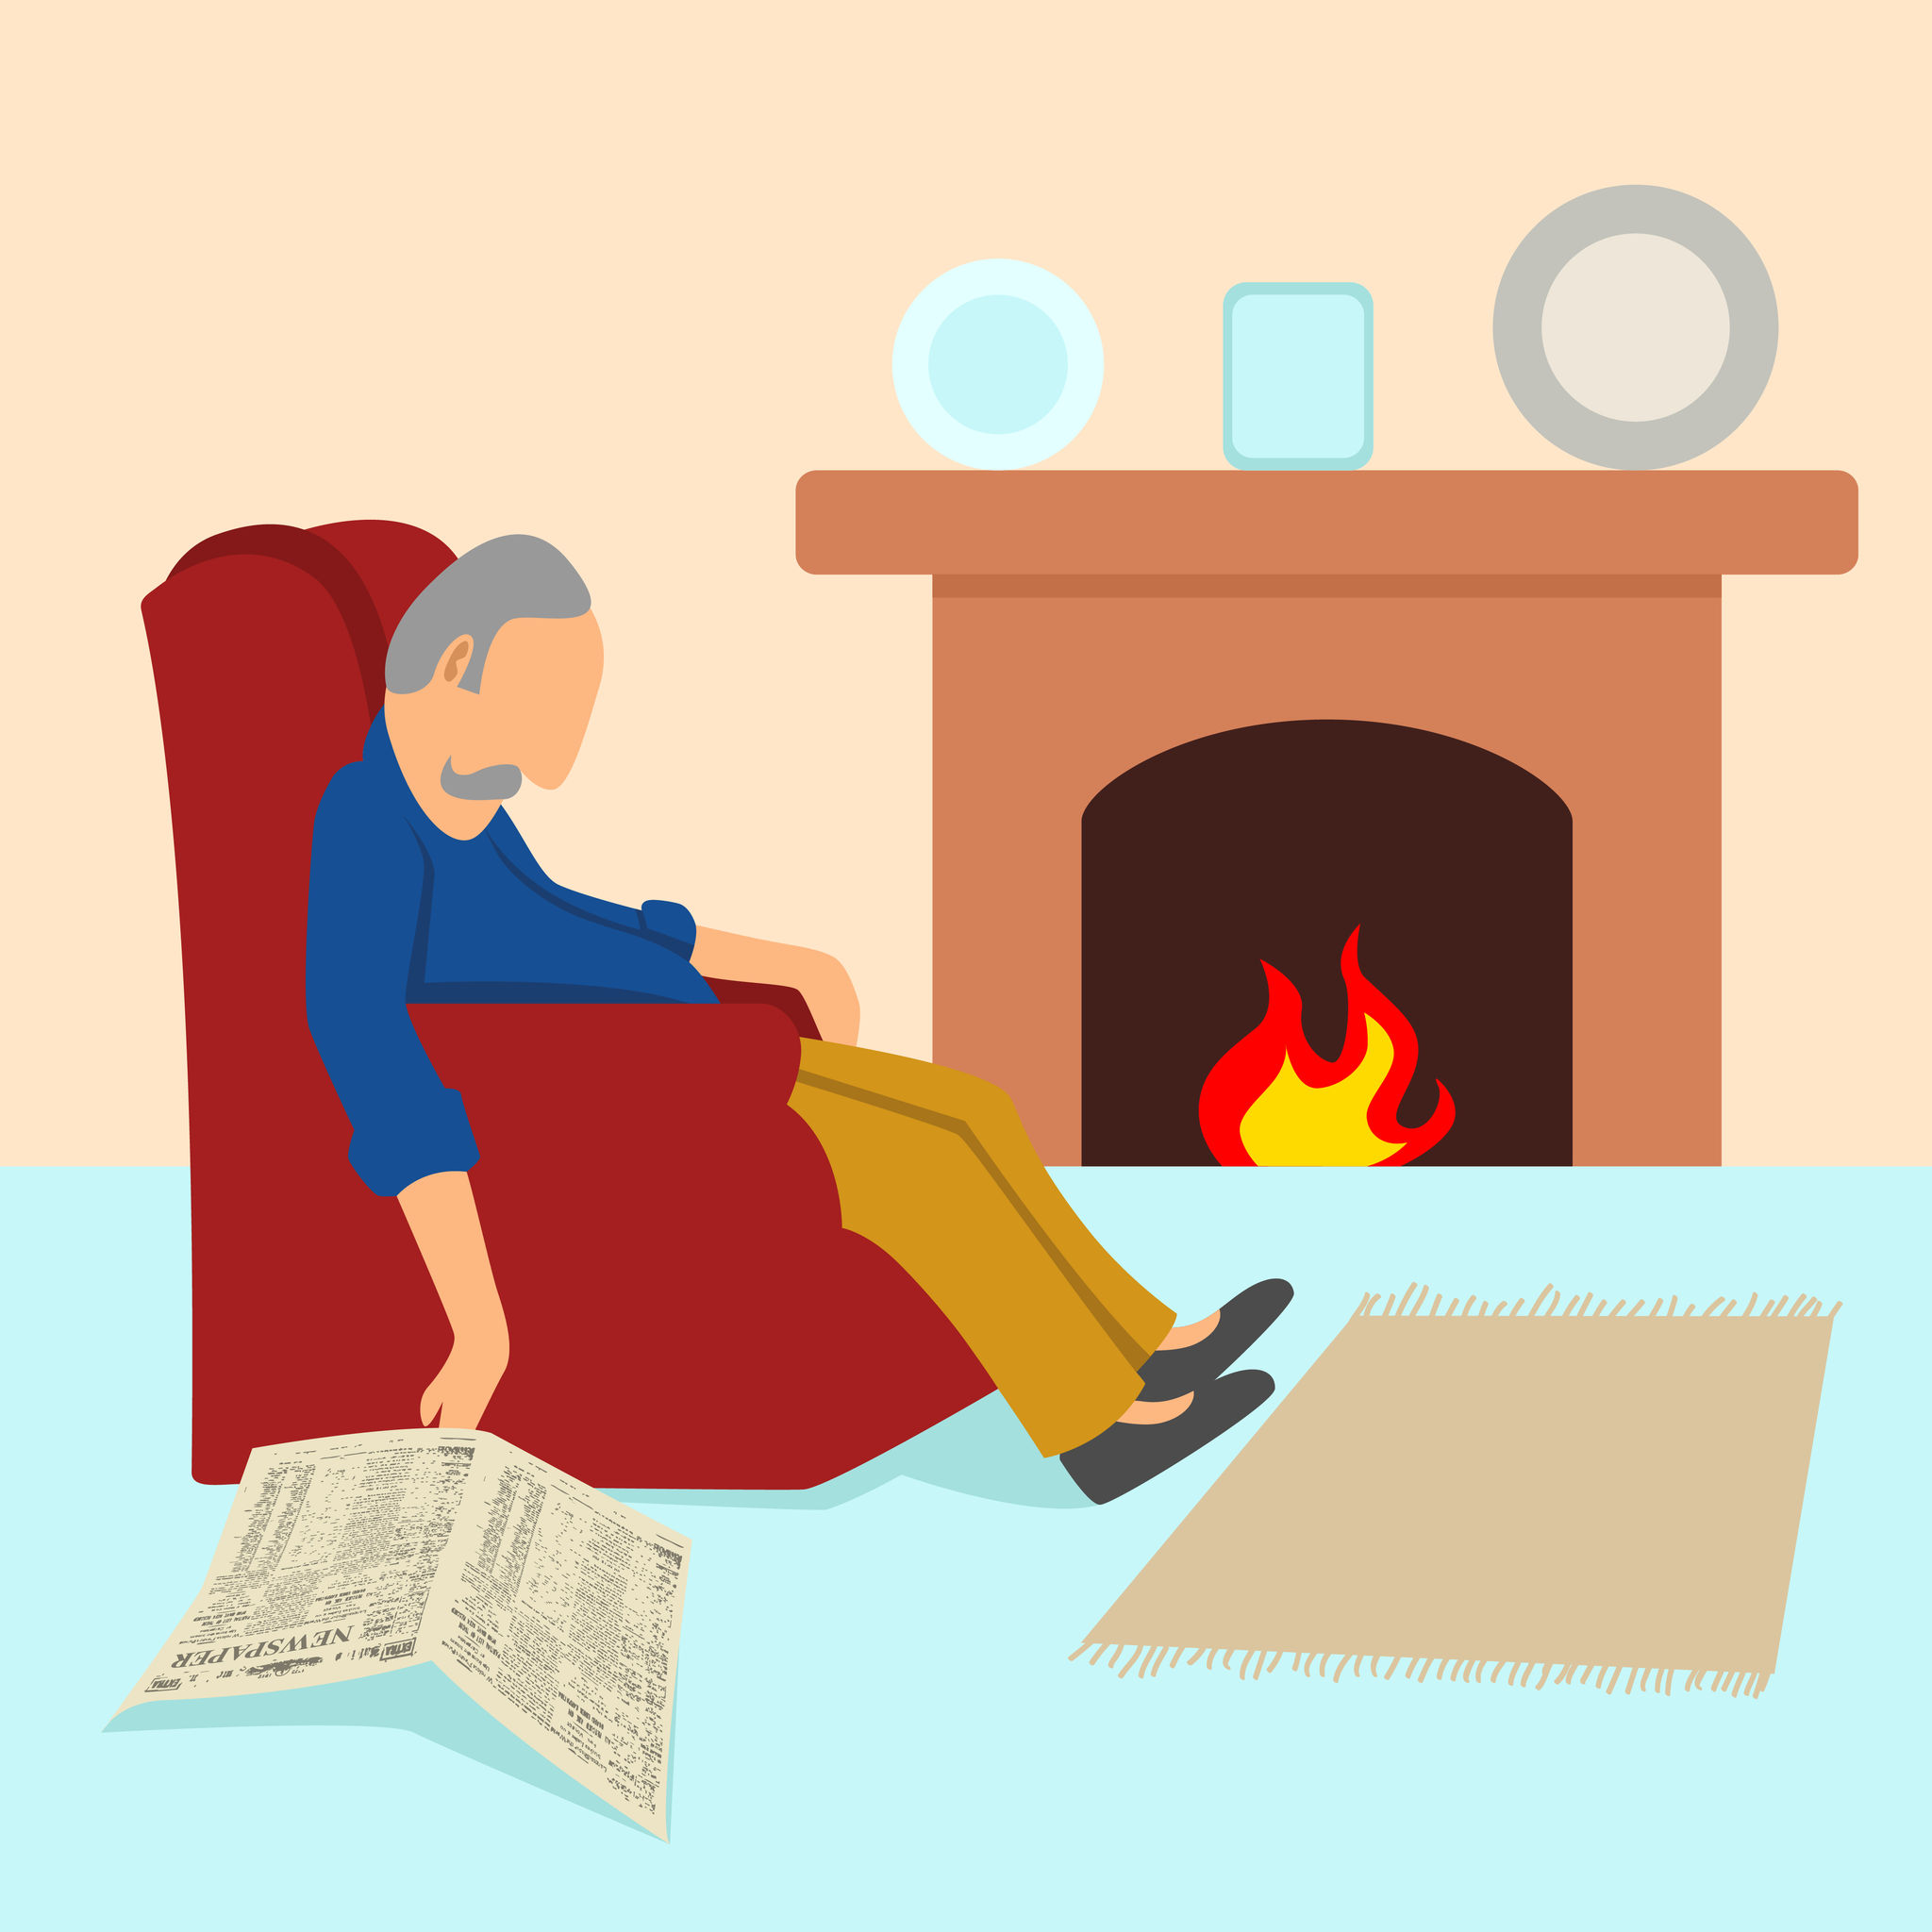 síntomas de cansancio: astenia